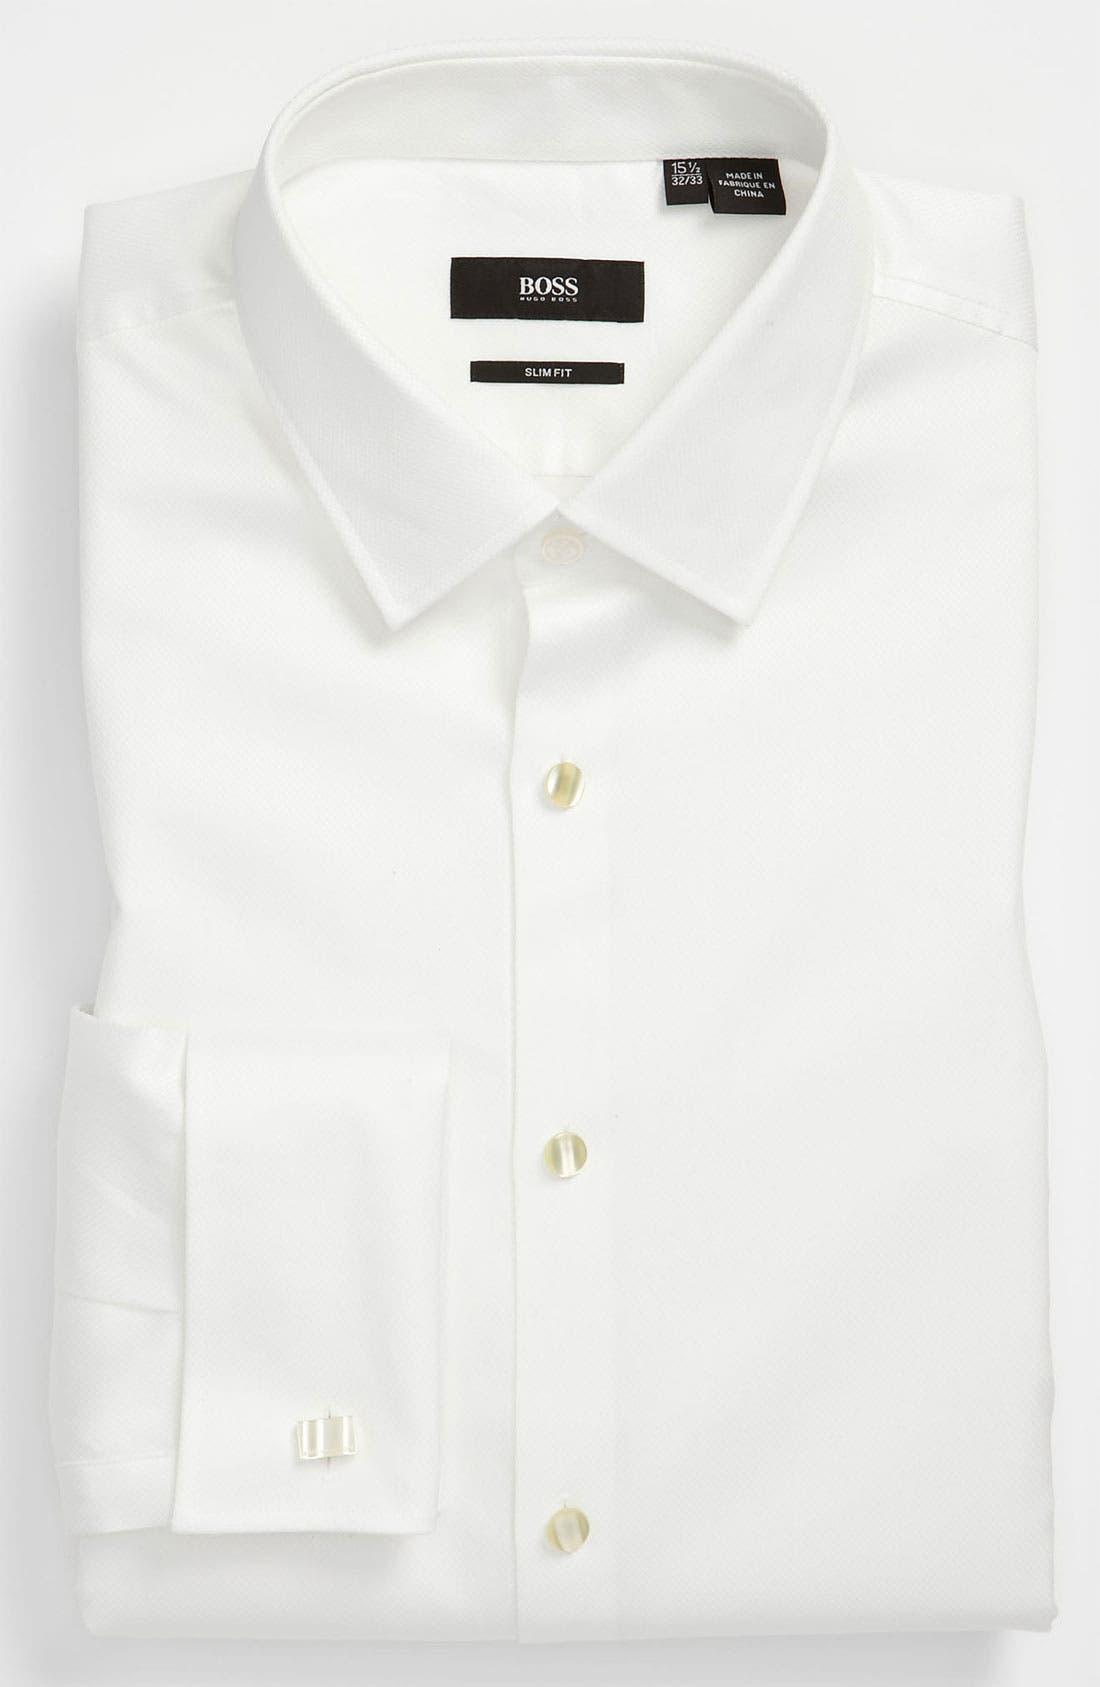 BOSS, Jameson Slim Fit Diamond Weave French Cuff Tuxedo Shirt, Main thumbnail 1, color, 120